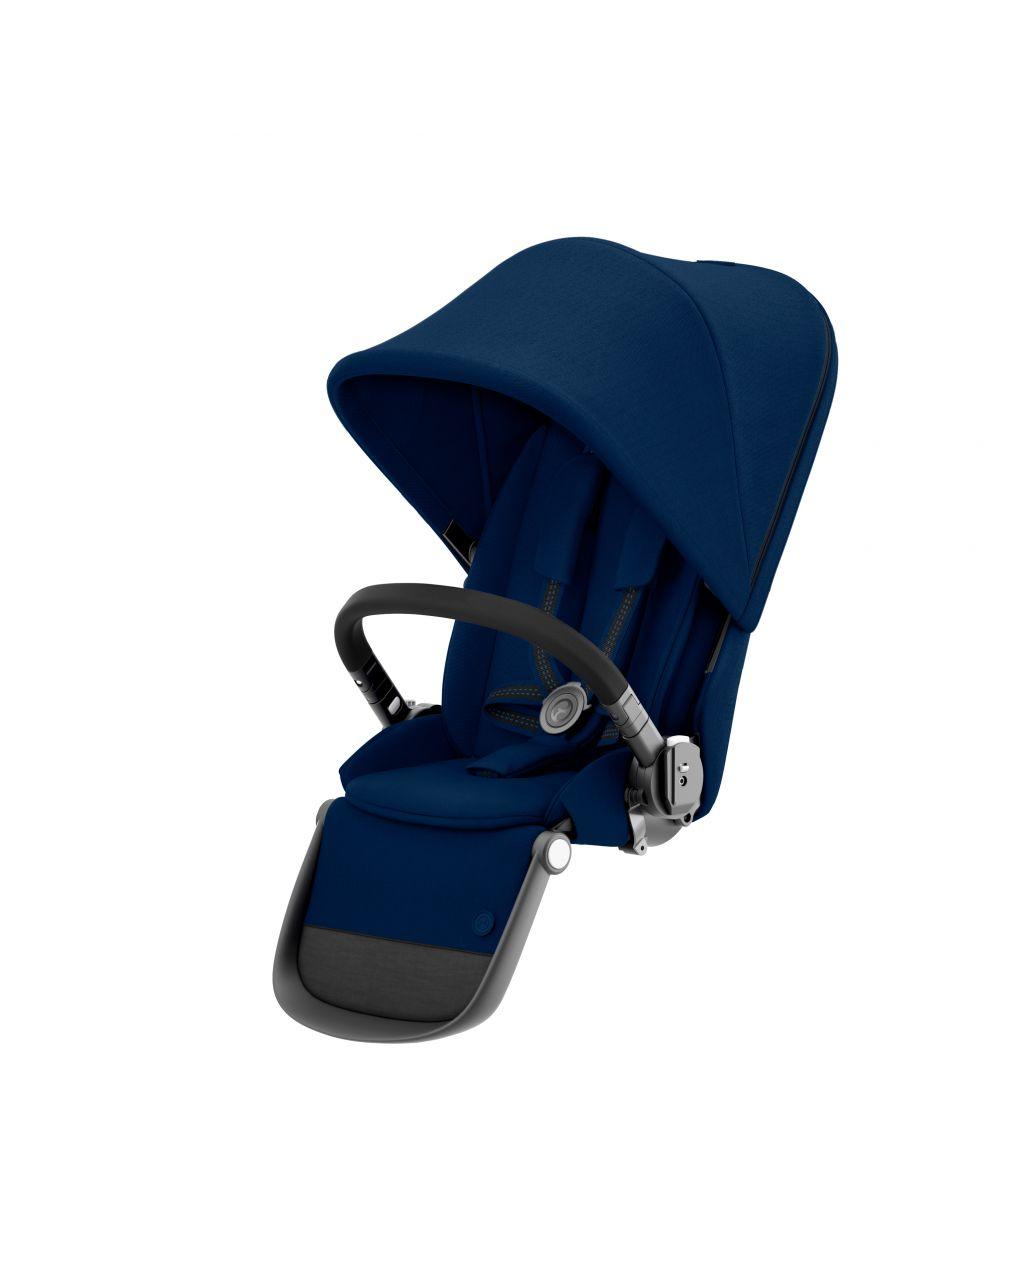 Cybex Gazelle S Κάθισμα Union - Μπλε - Black Frame